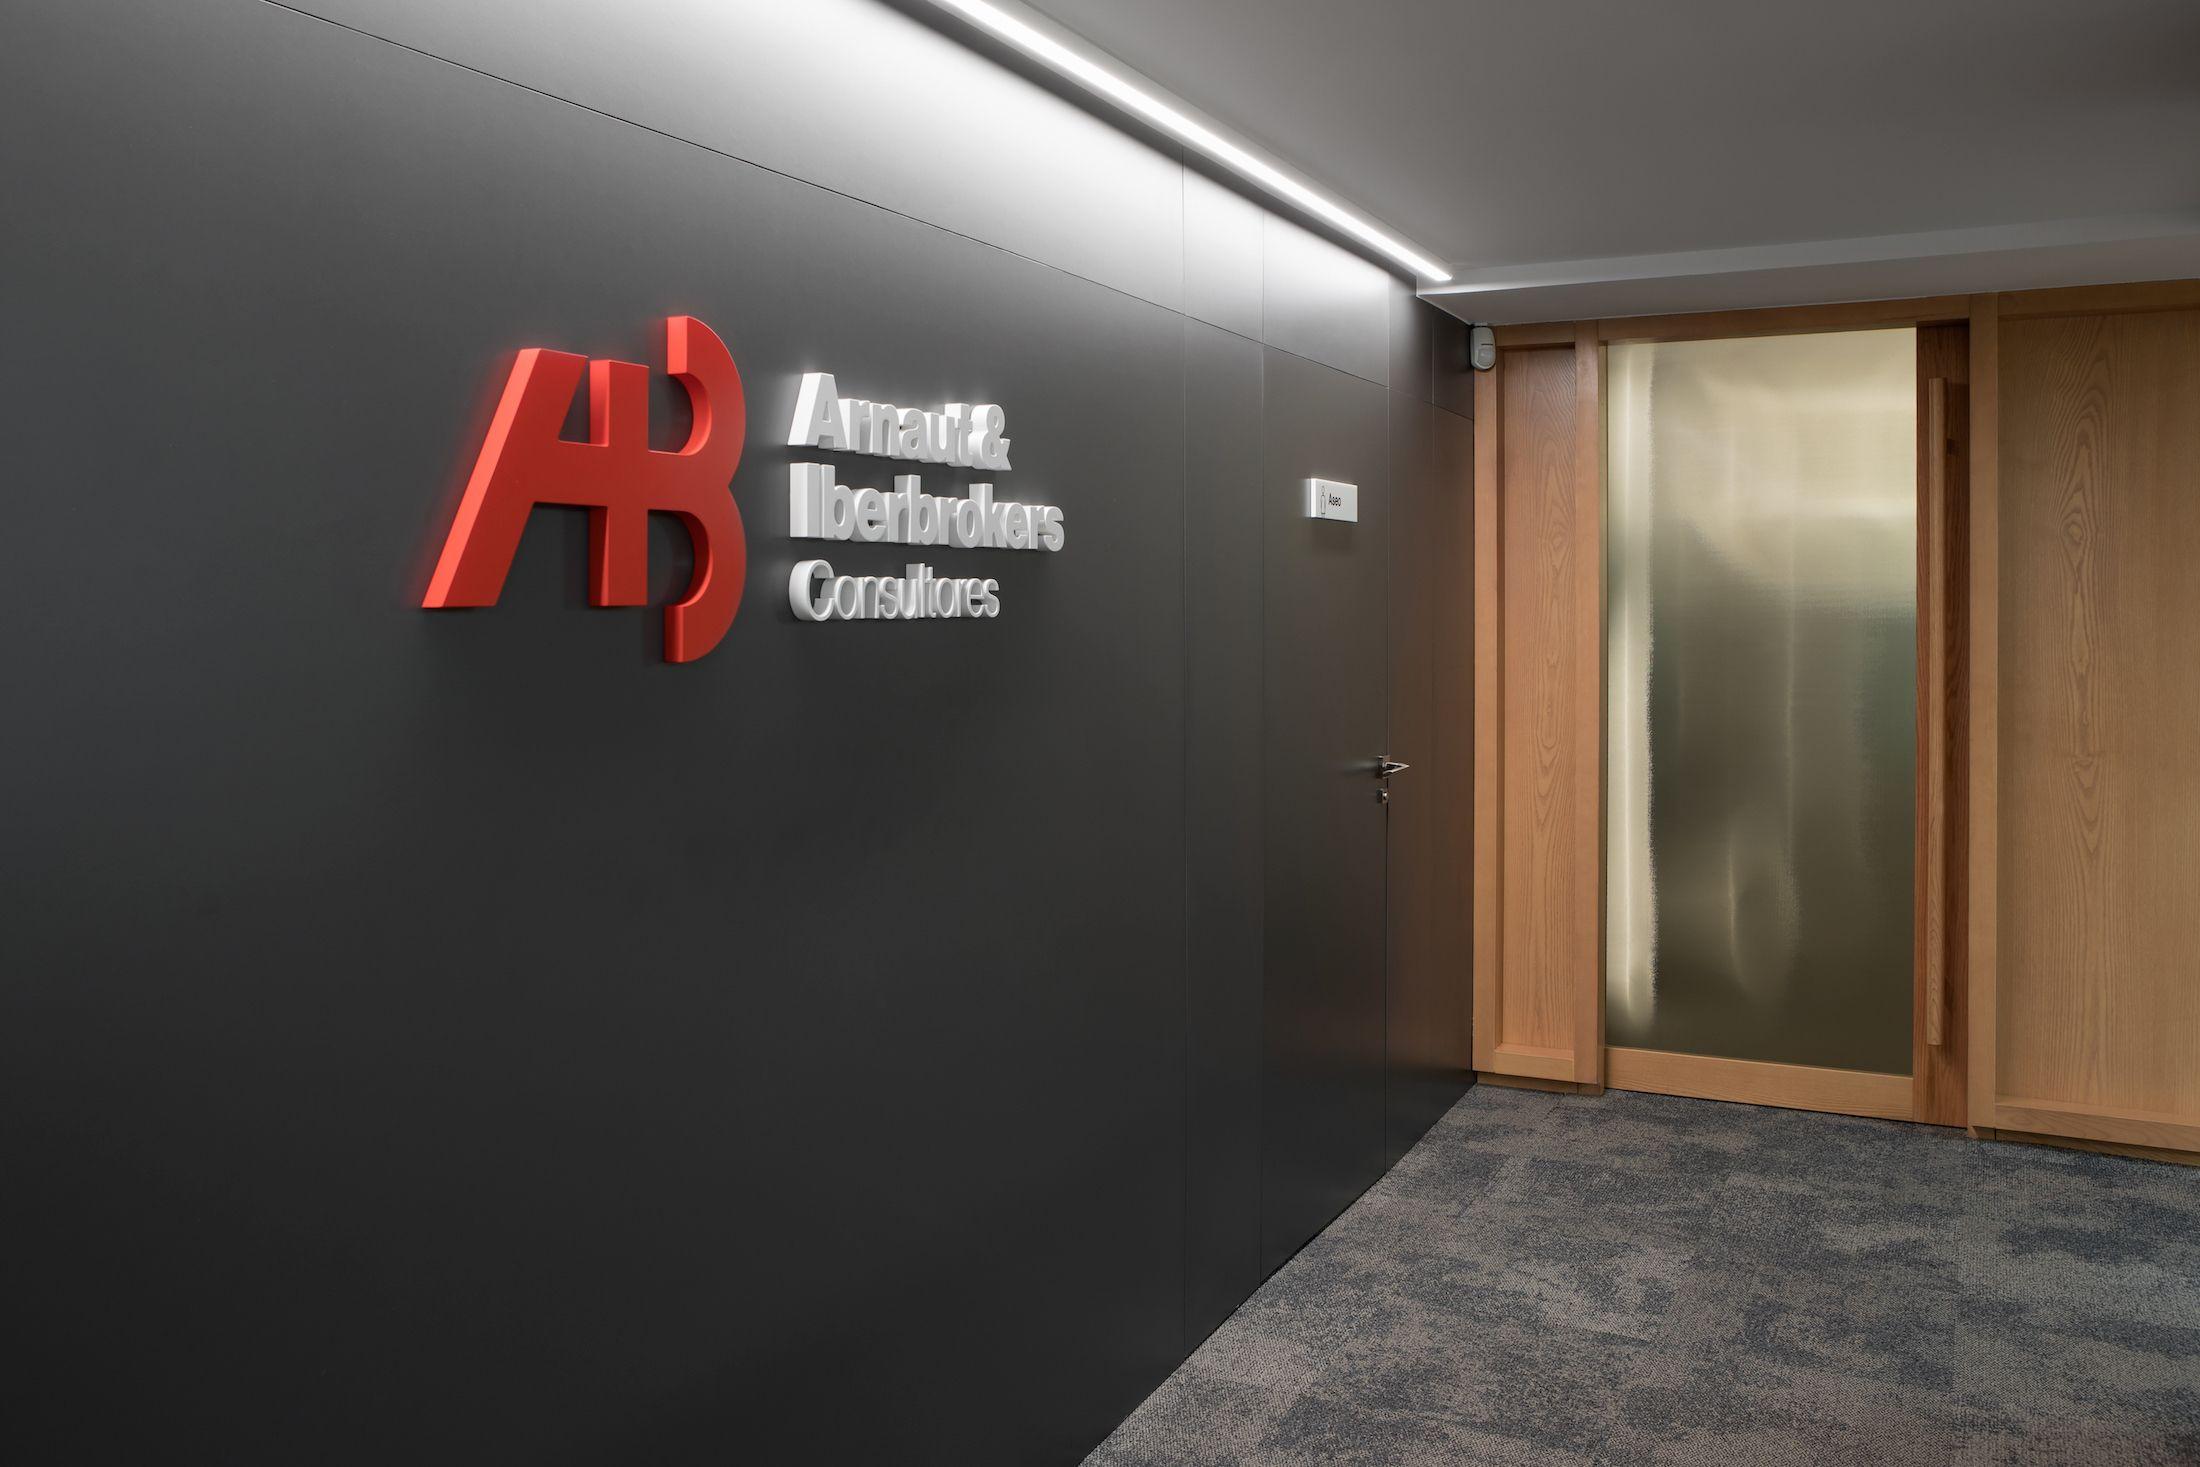 Diseño integral interiorismo reforma oficinas centrales consultora Arnaut & Iberbrokers   Perspectiva Moma